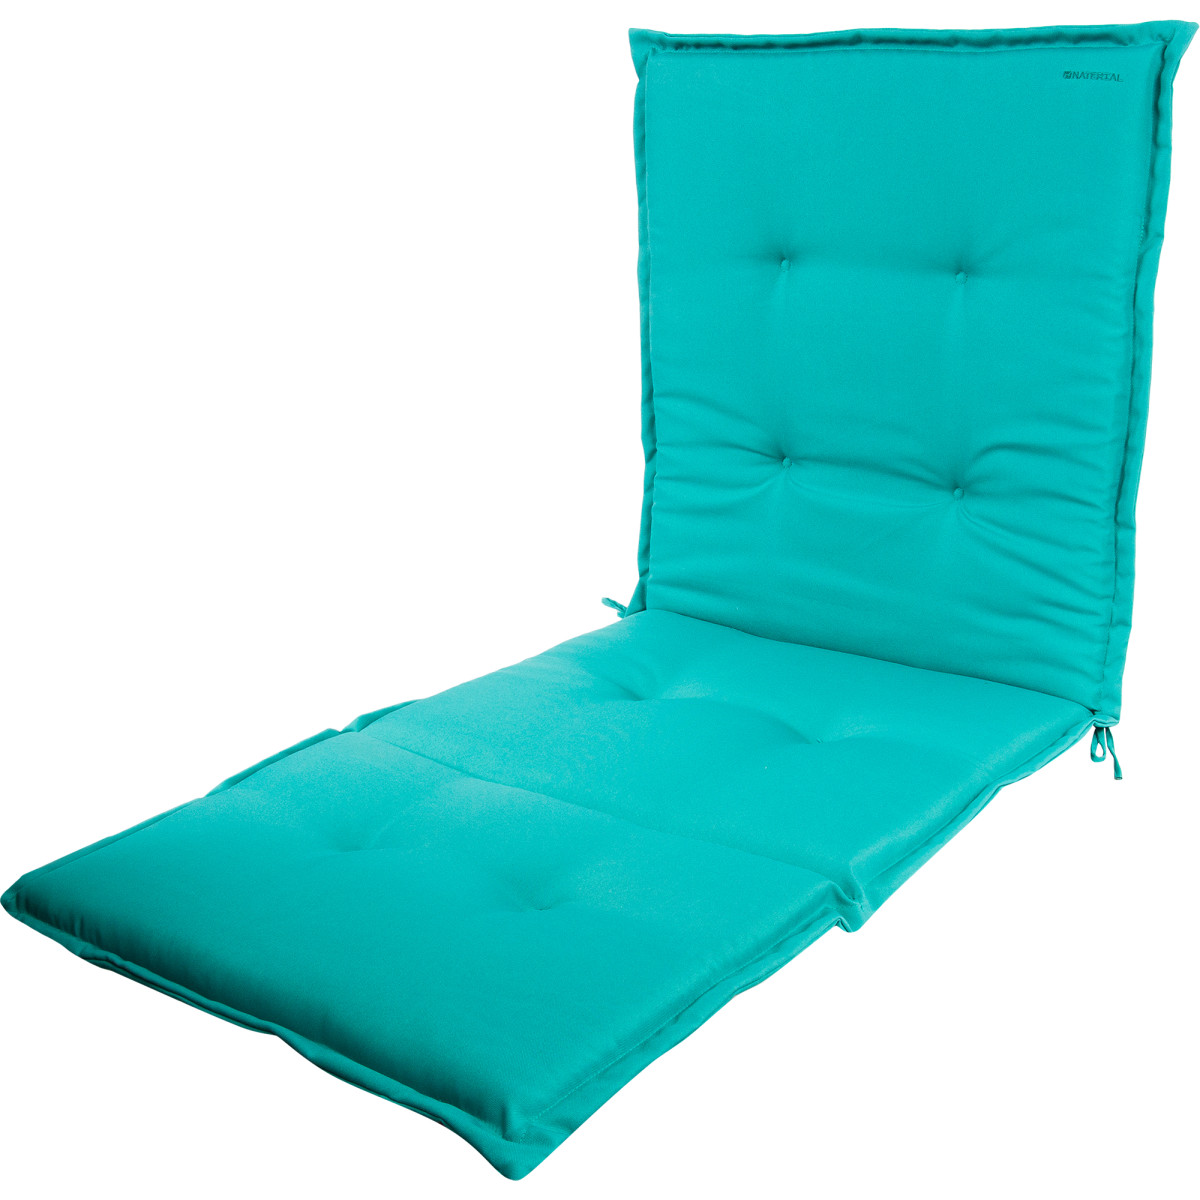 Подушка для шезлонга голубая 165х65х5 см полиэстер